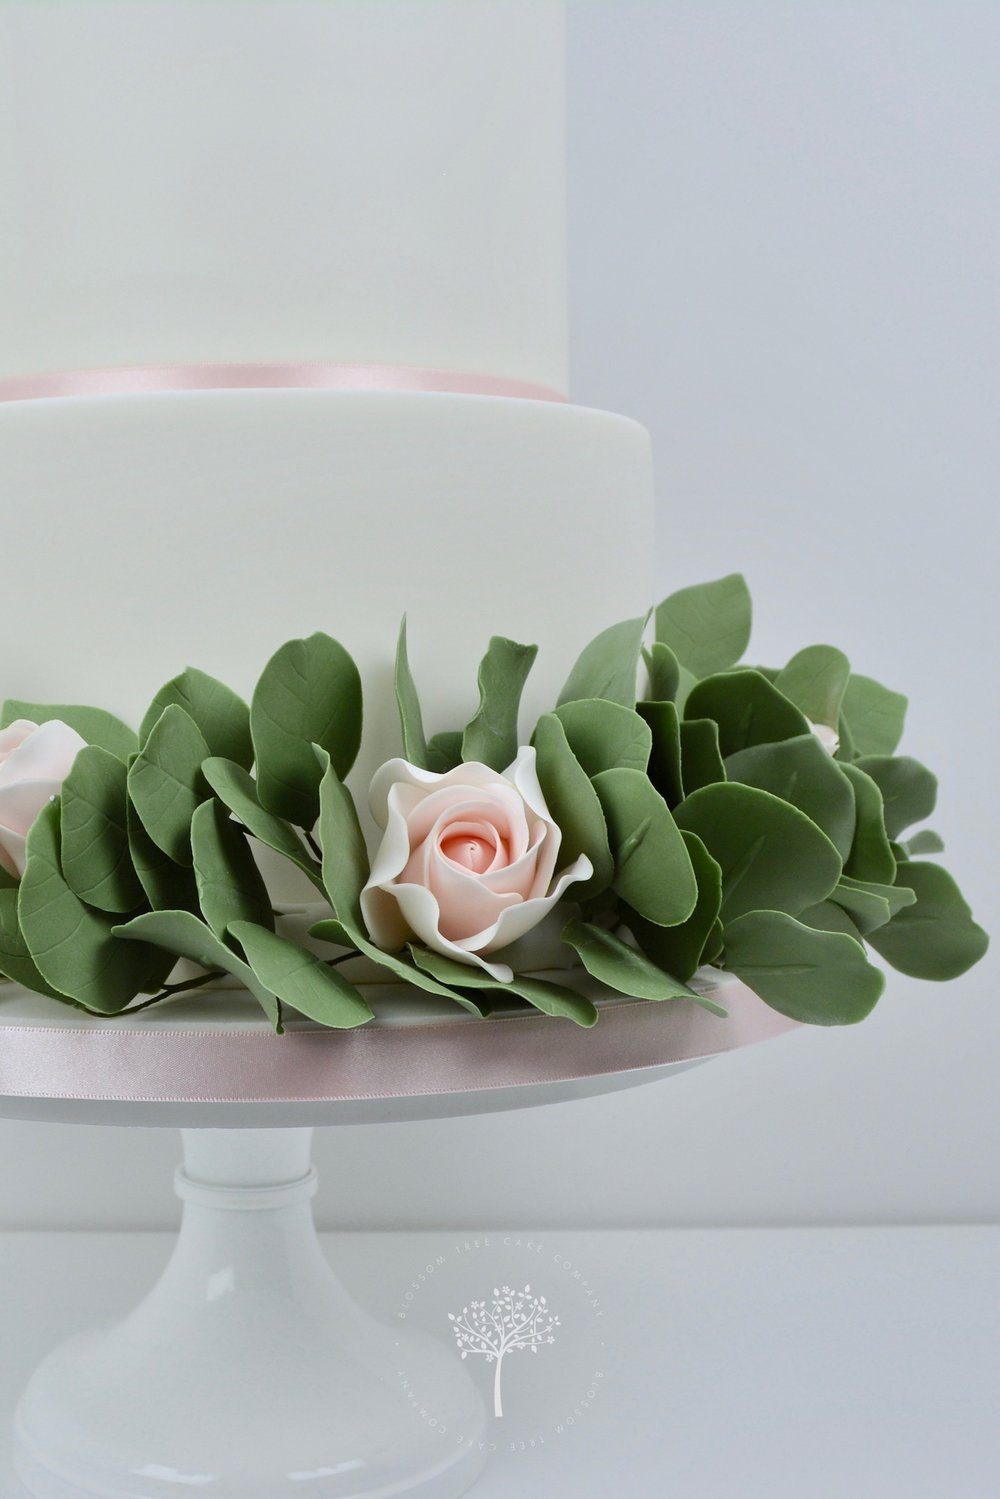 Roses and Silver Dollar wedding cake by Blossom Tree Cake Company - eucalyptus garland.jpg